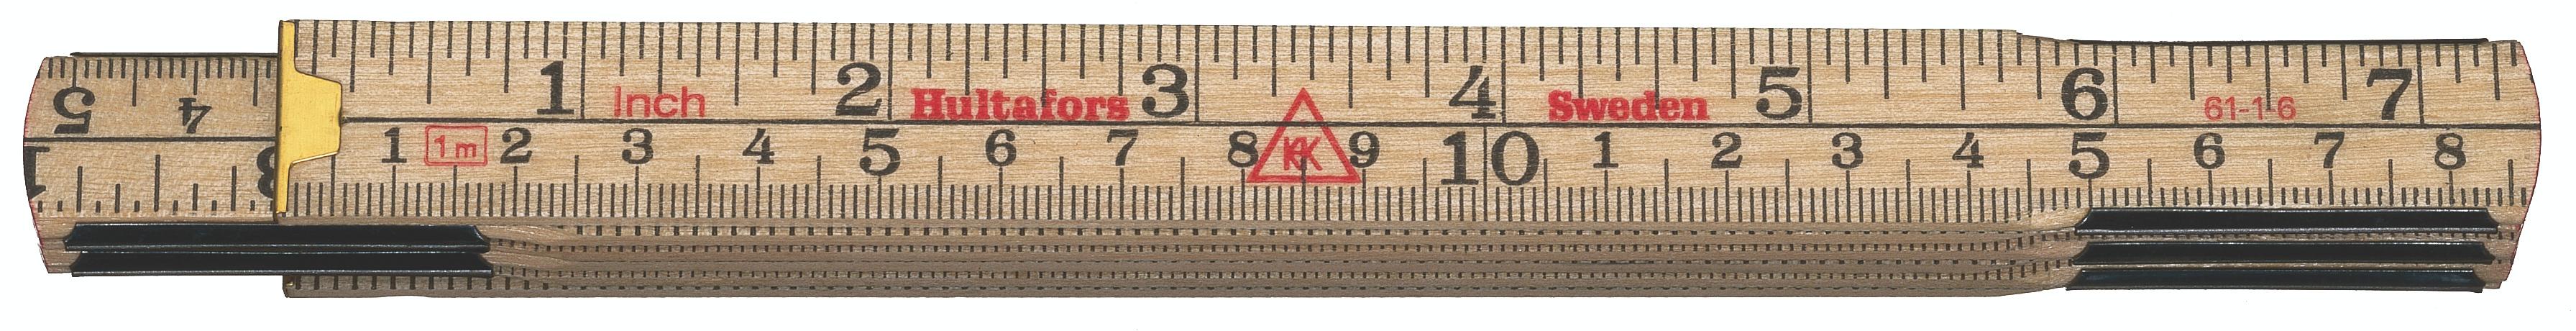 Hultafors Folding Rule 61 — 1m, 6 sections HU-100704